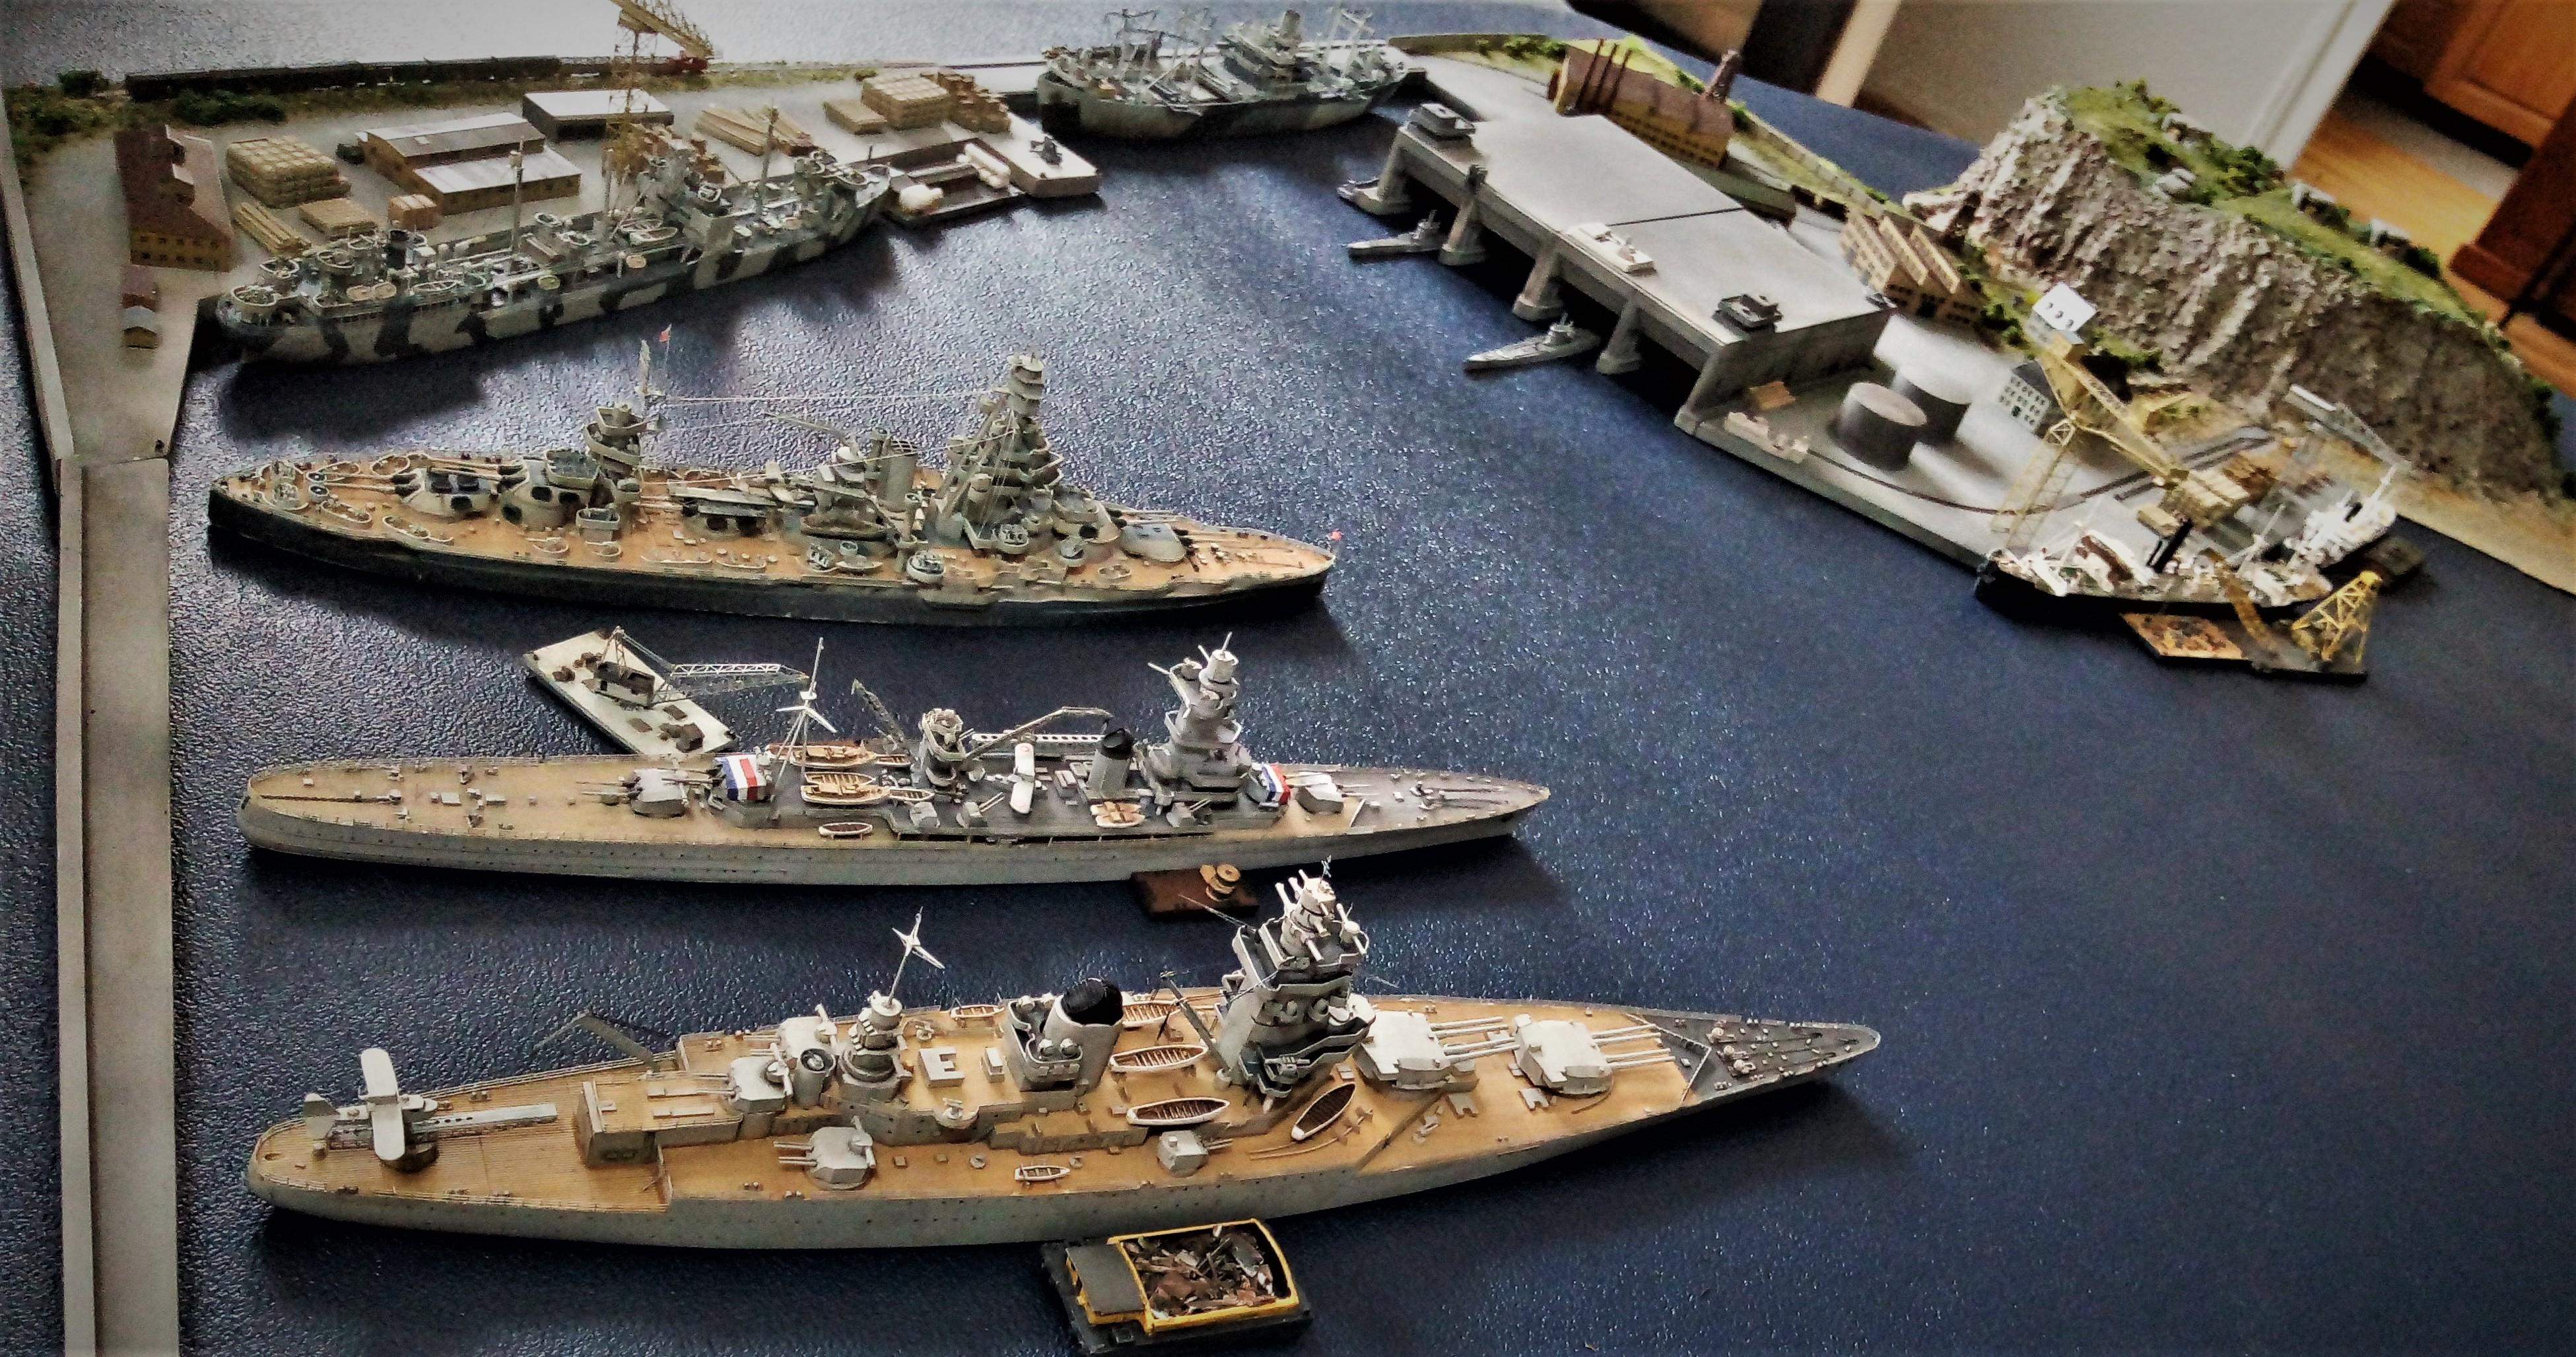 Diorama base navale 1/700 par Nesquik - Page 4 ExGu9f0Vy